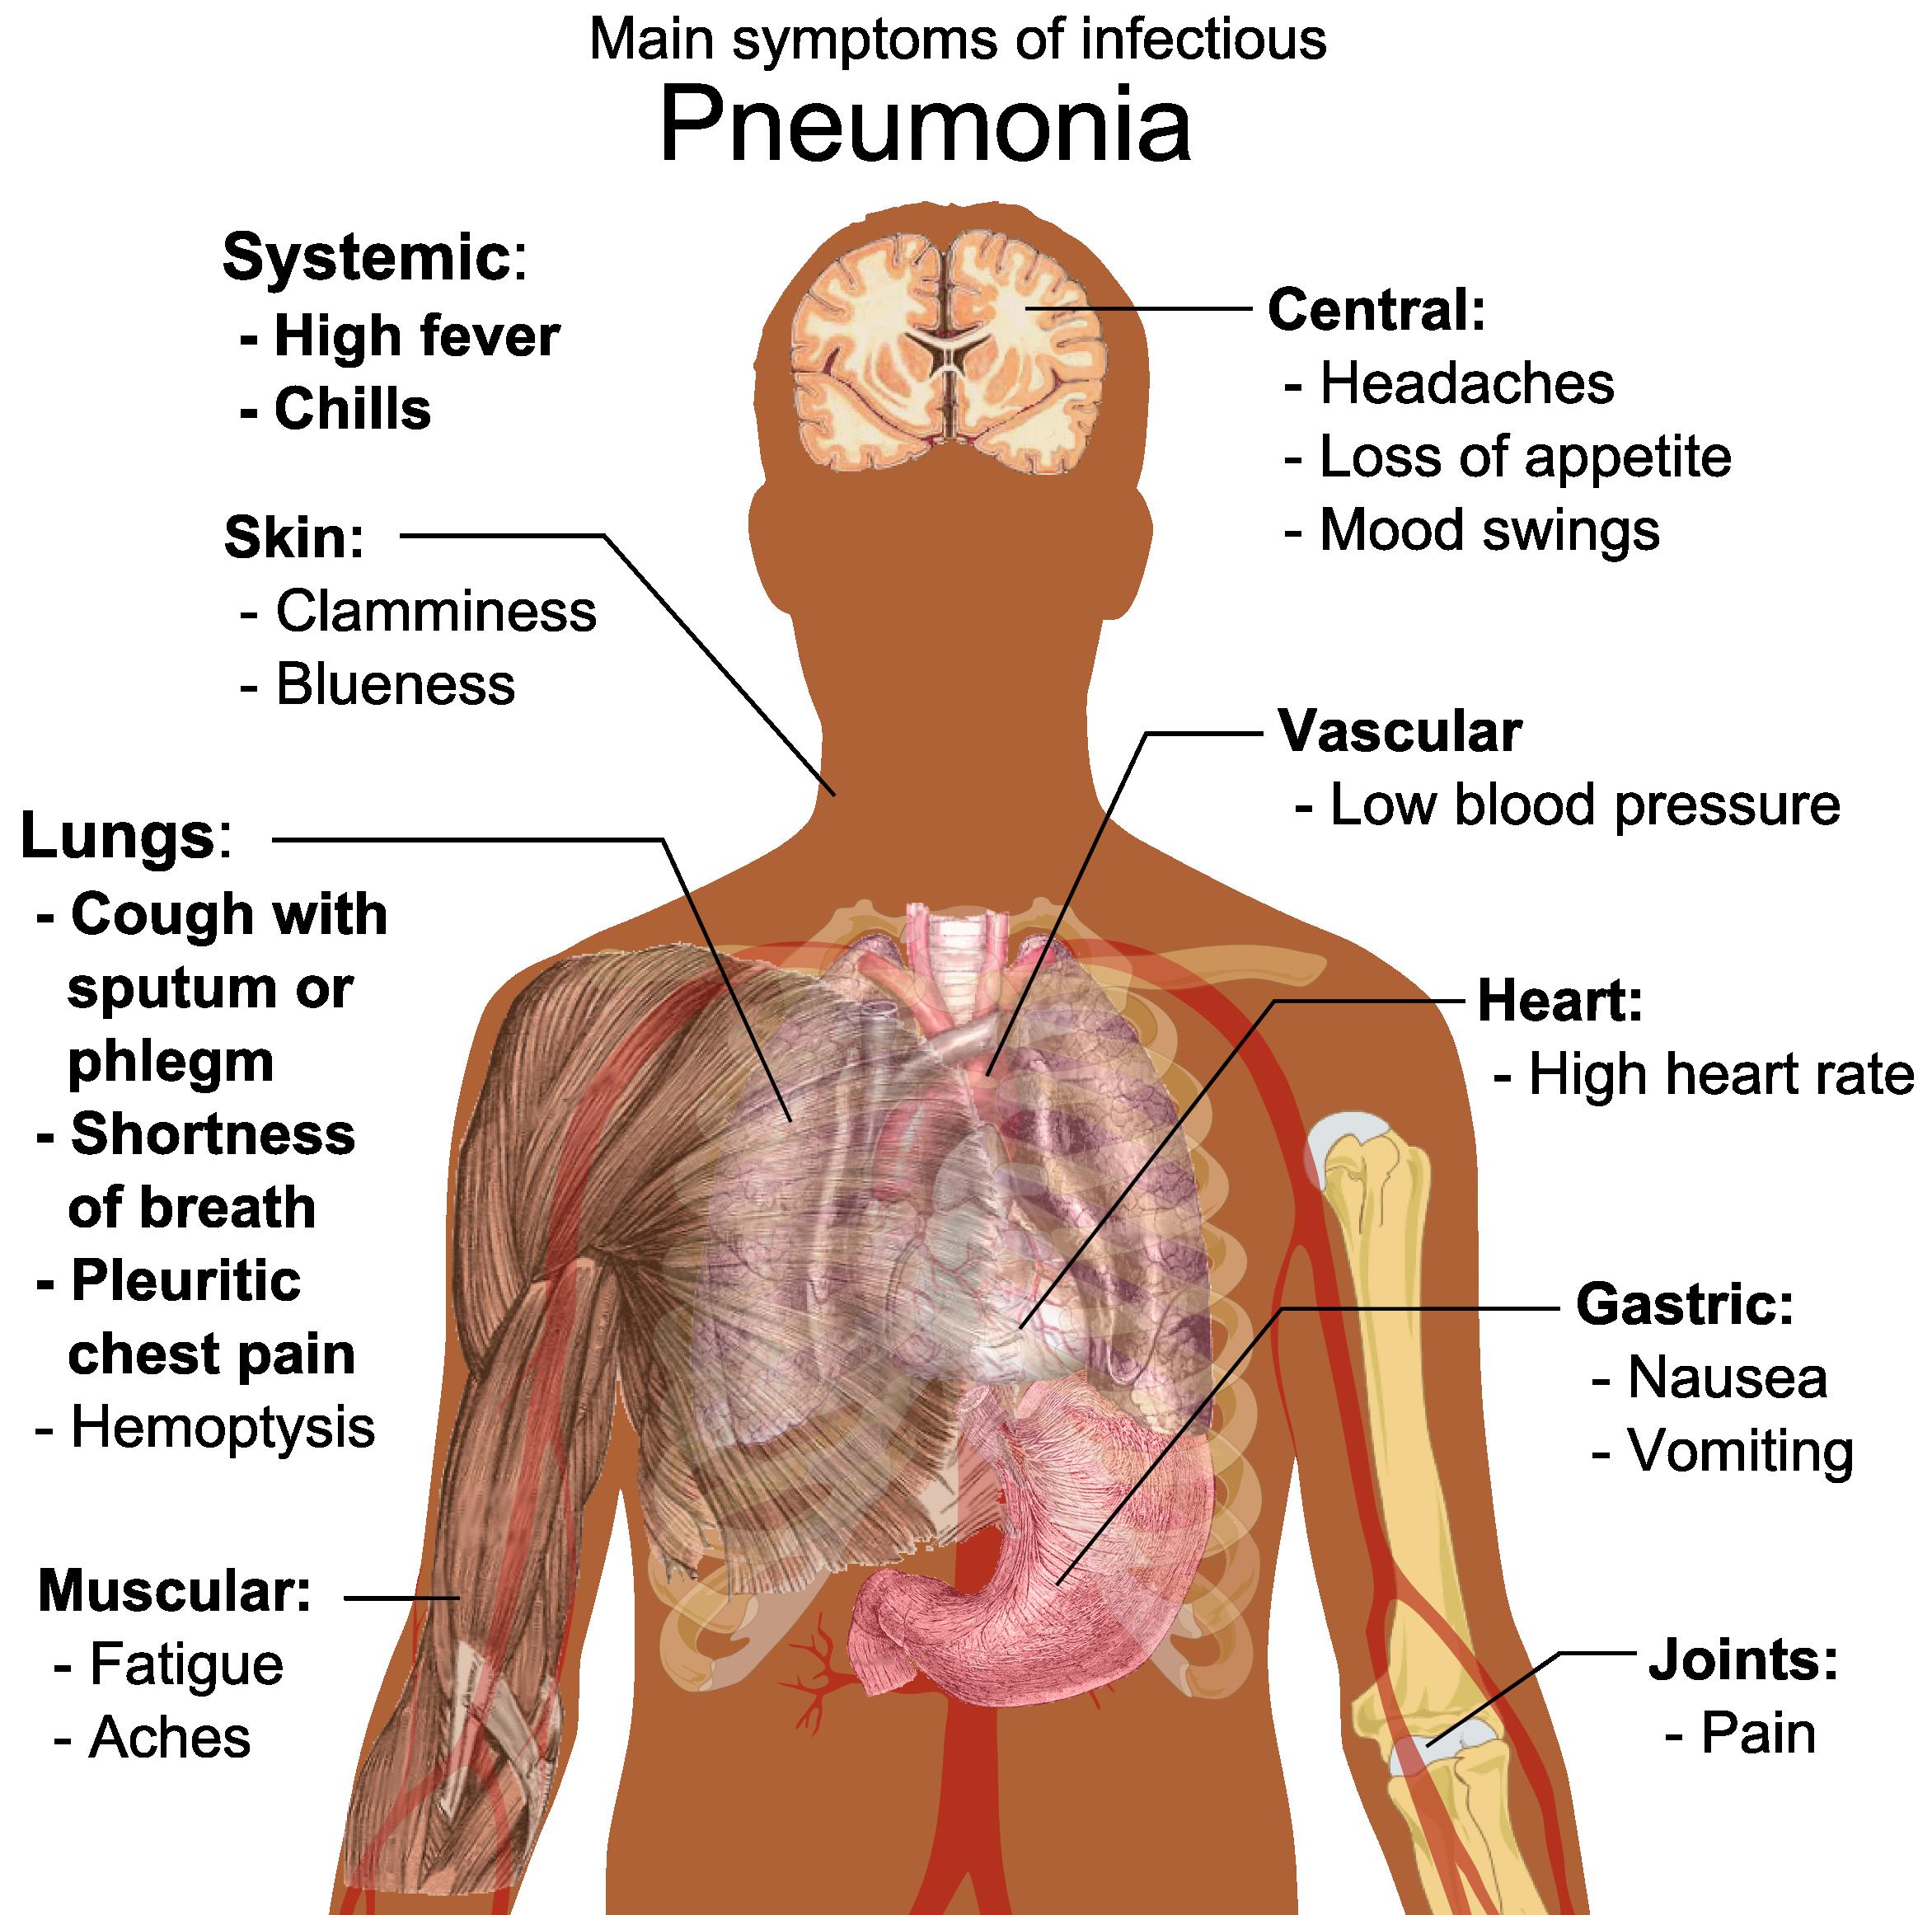 File:Main symptoms of infectious pneumonia.png - Pneumonia Patient PNG